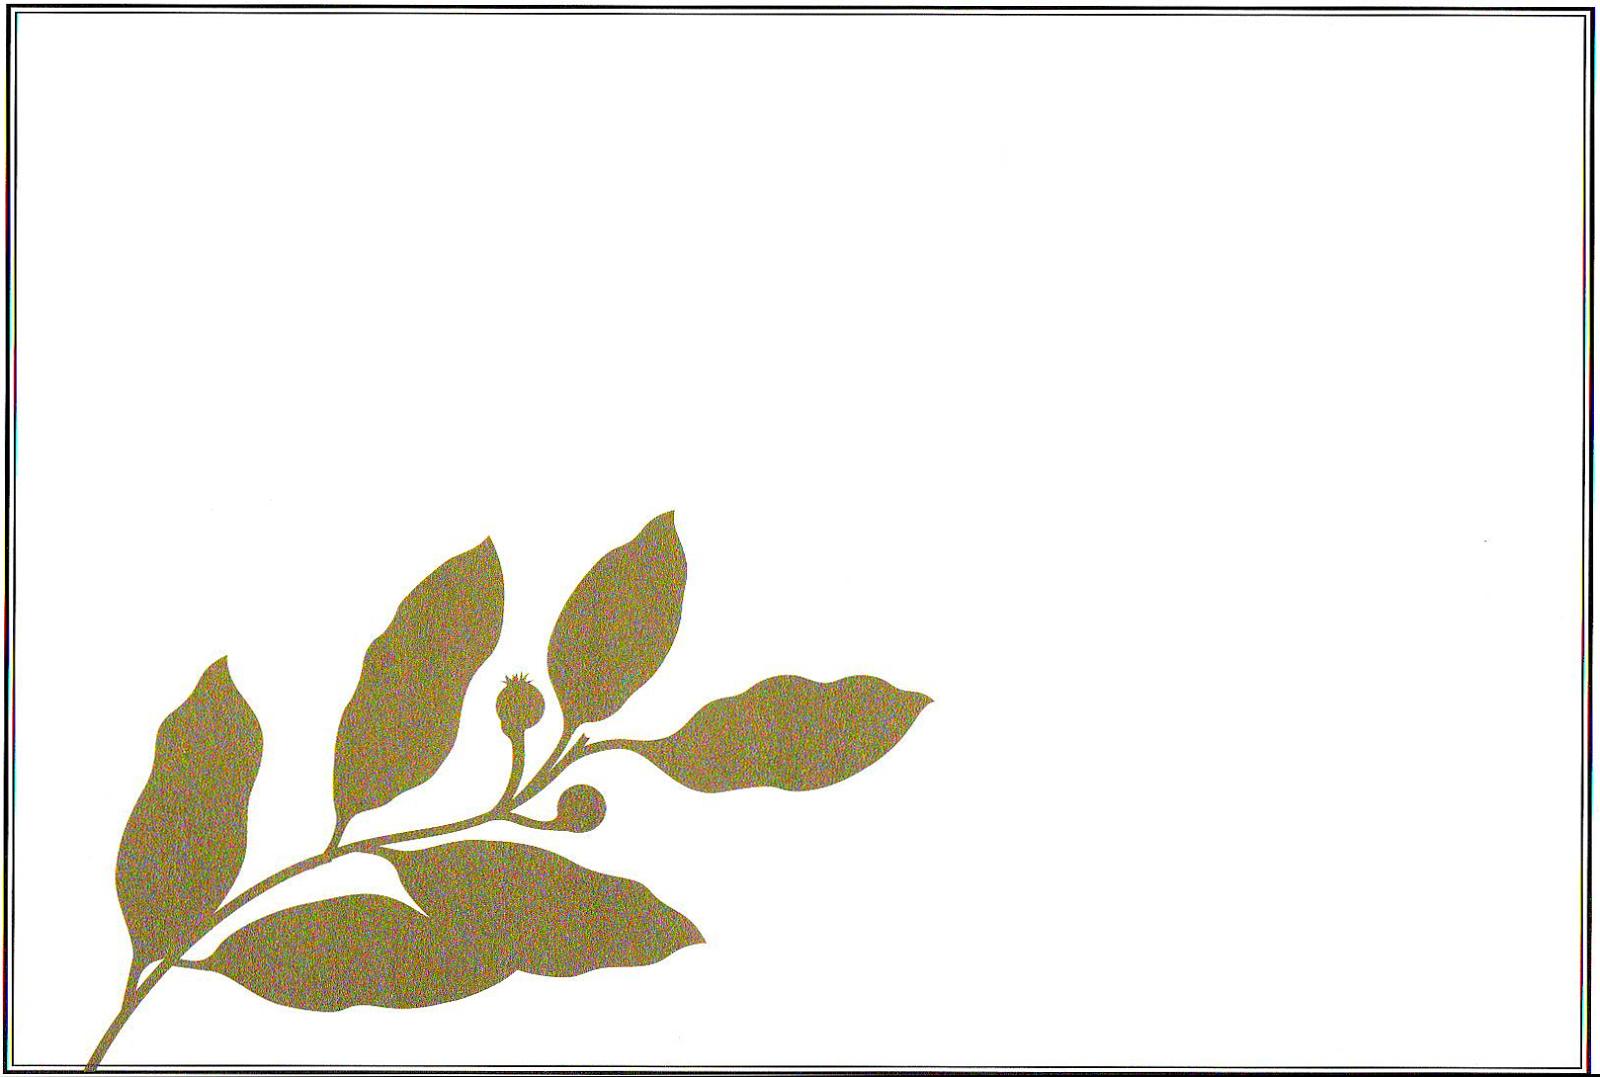 gambar Bingkai untuk Sertifikat atau Ijazah